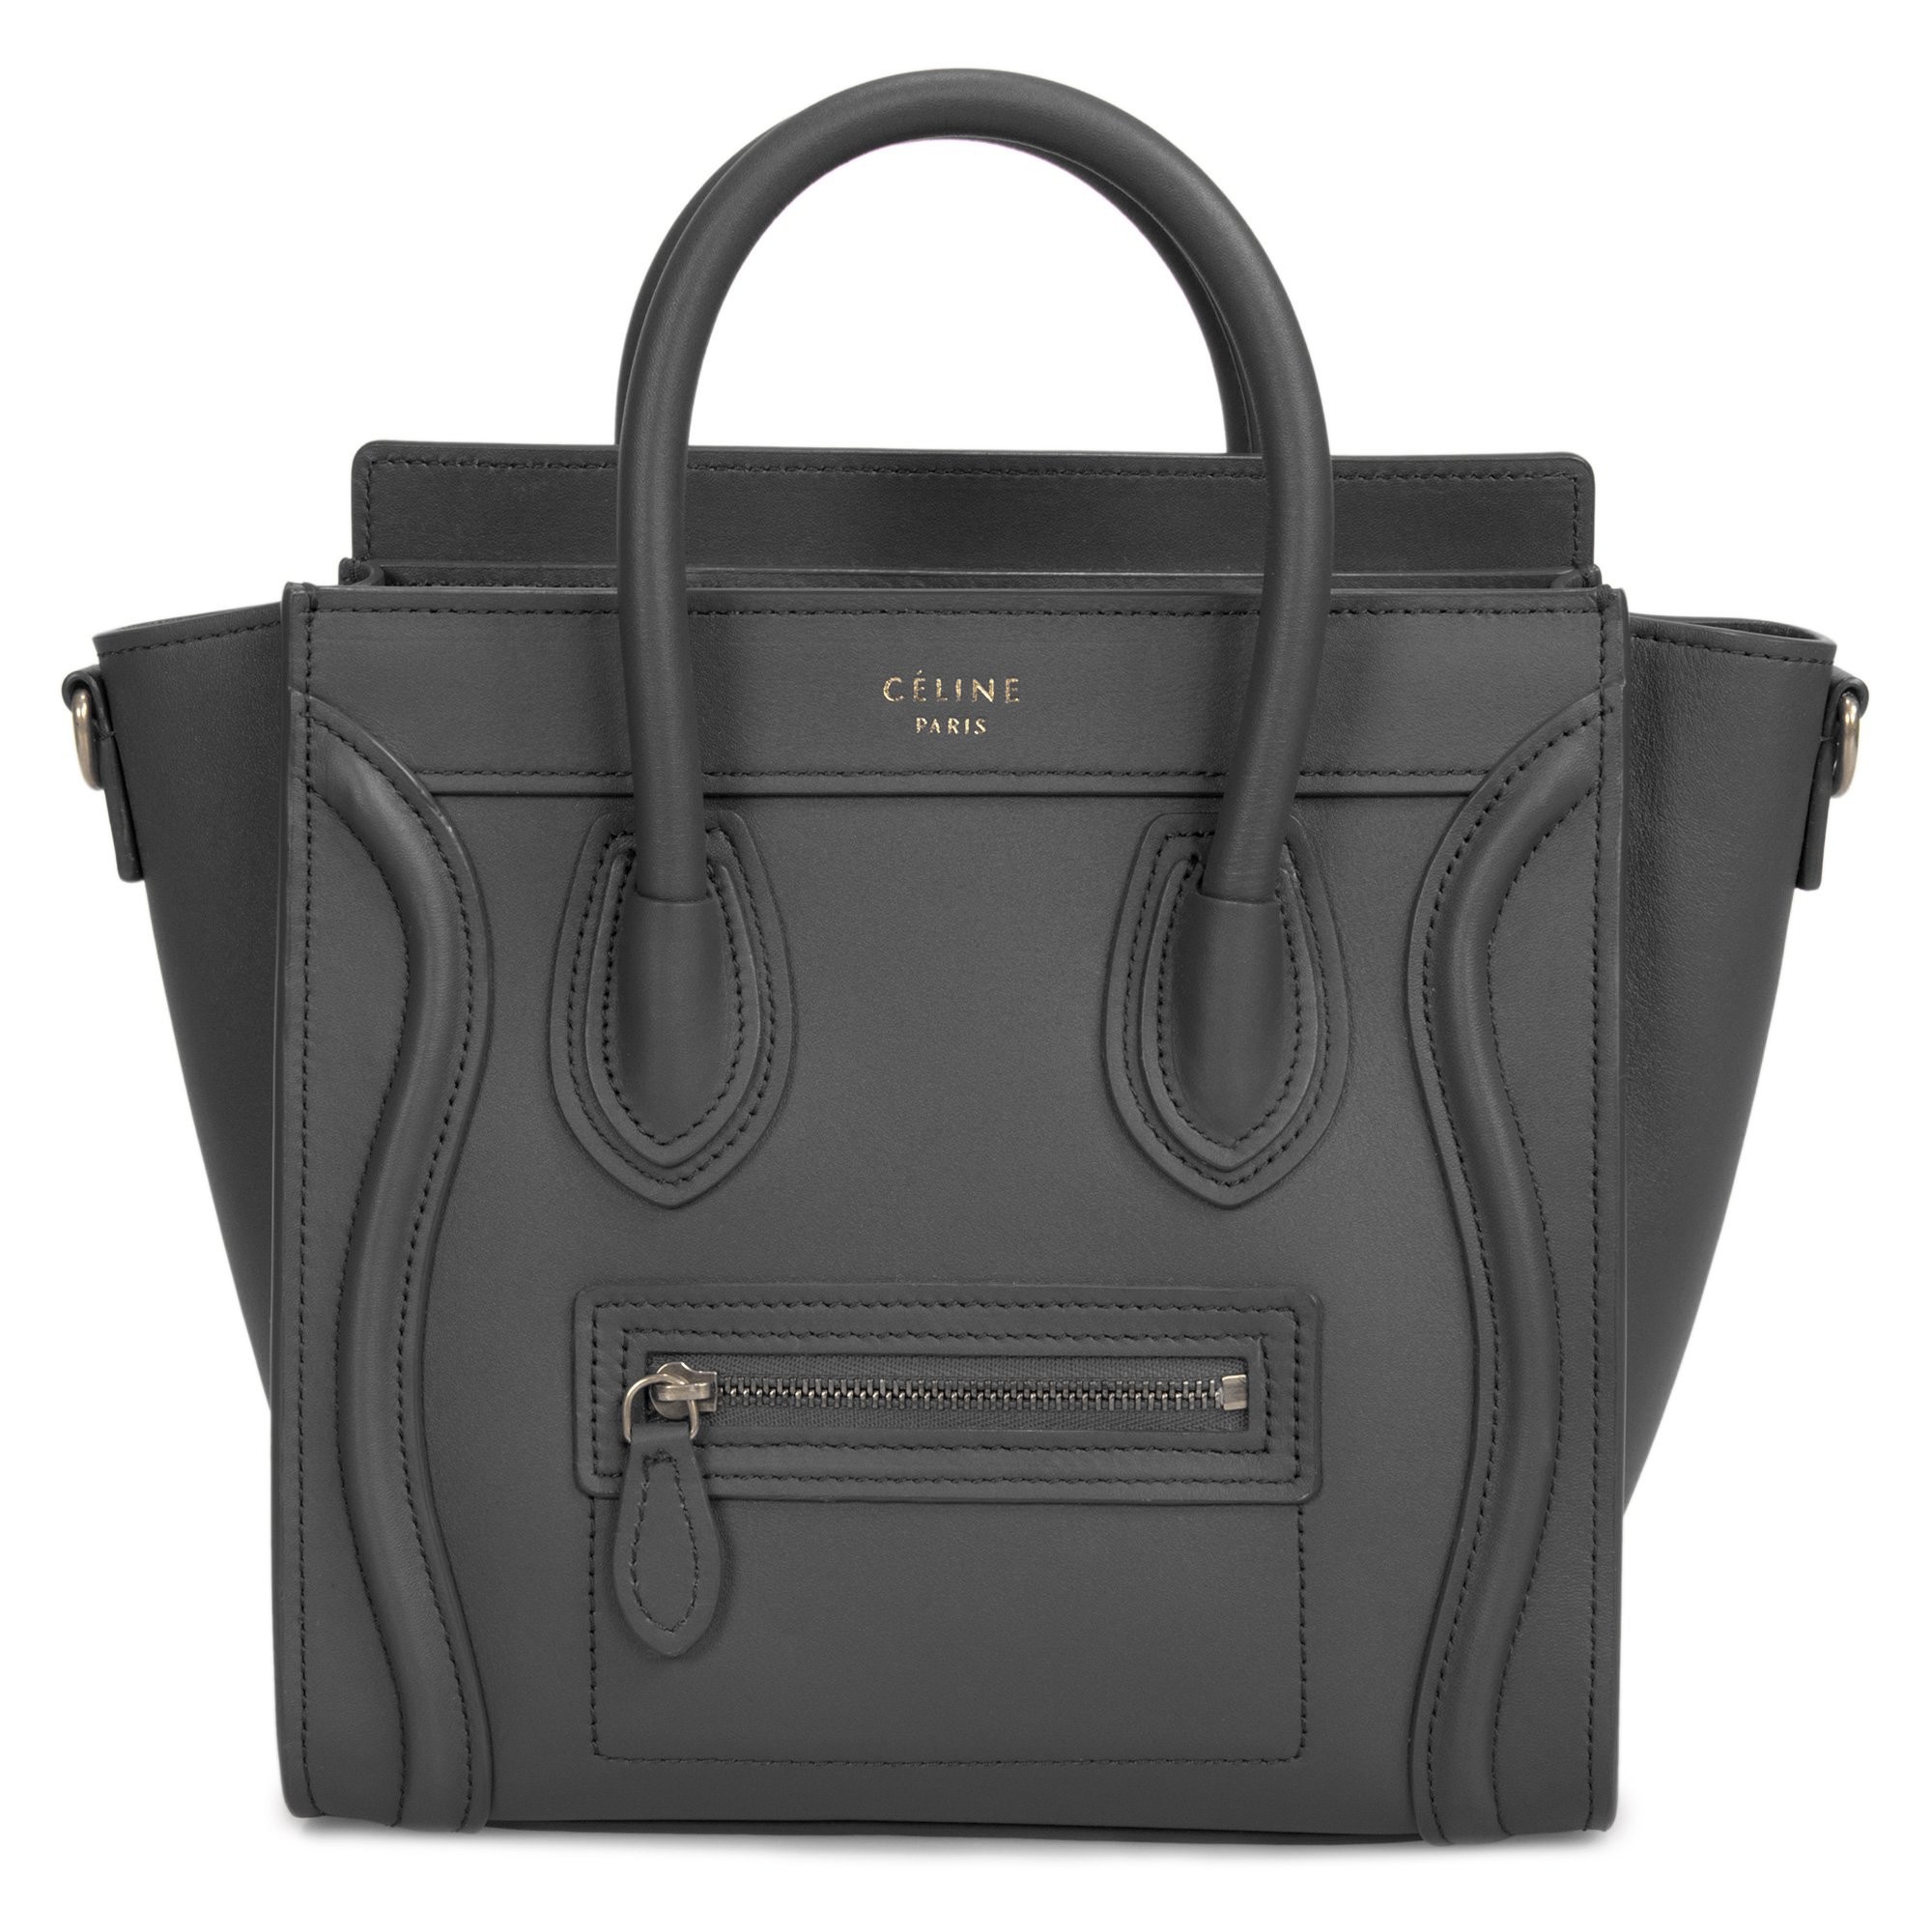 Celine Nano Luggage Bag In Smooth Black Calfskin Leather by Celine